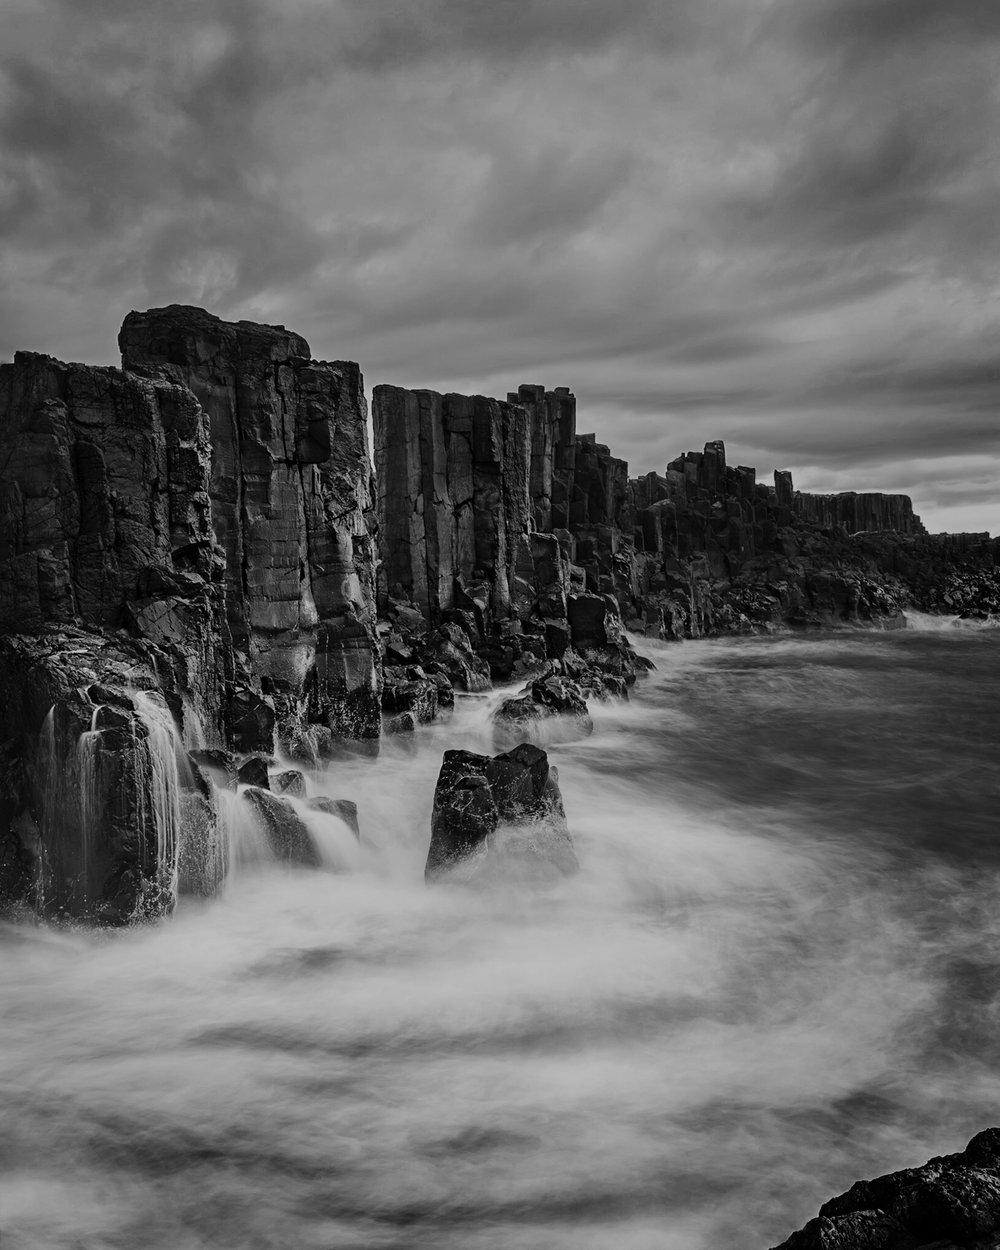 HELEN TRENERRY Photographer - Seascape - Bombo Power